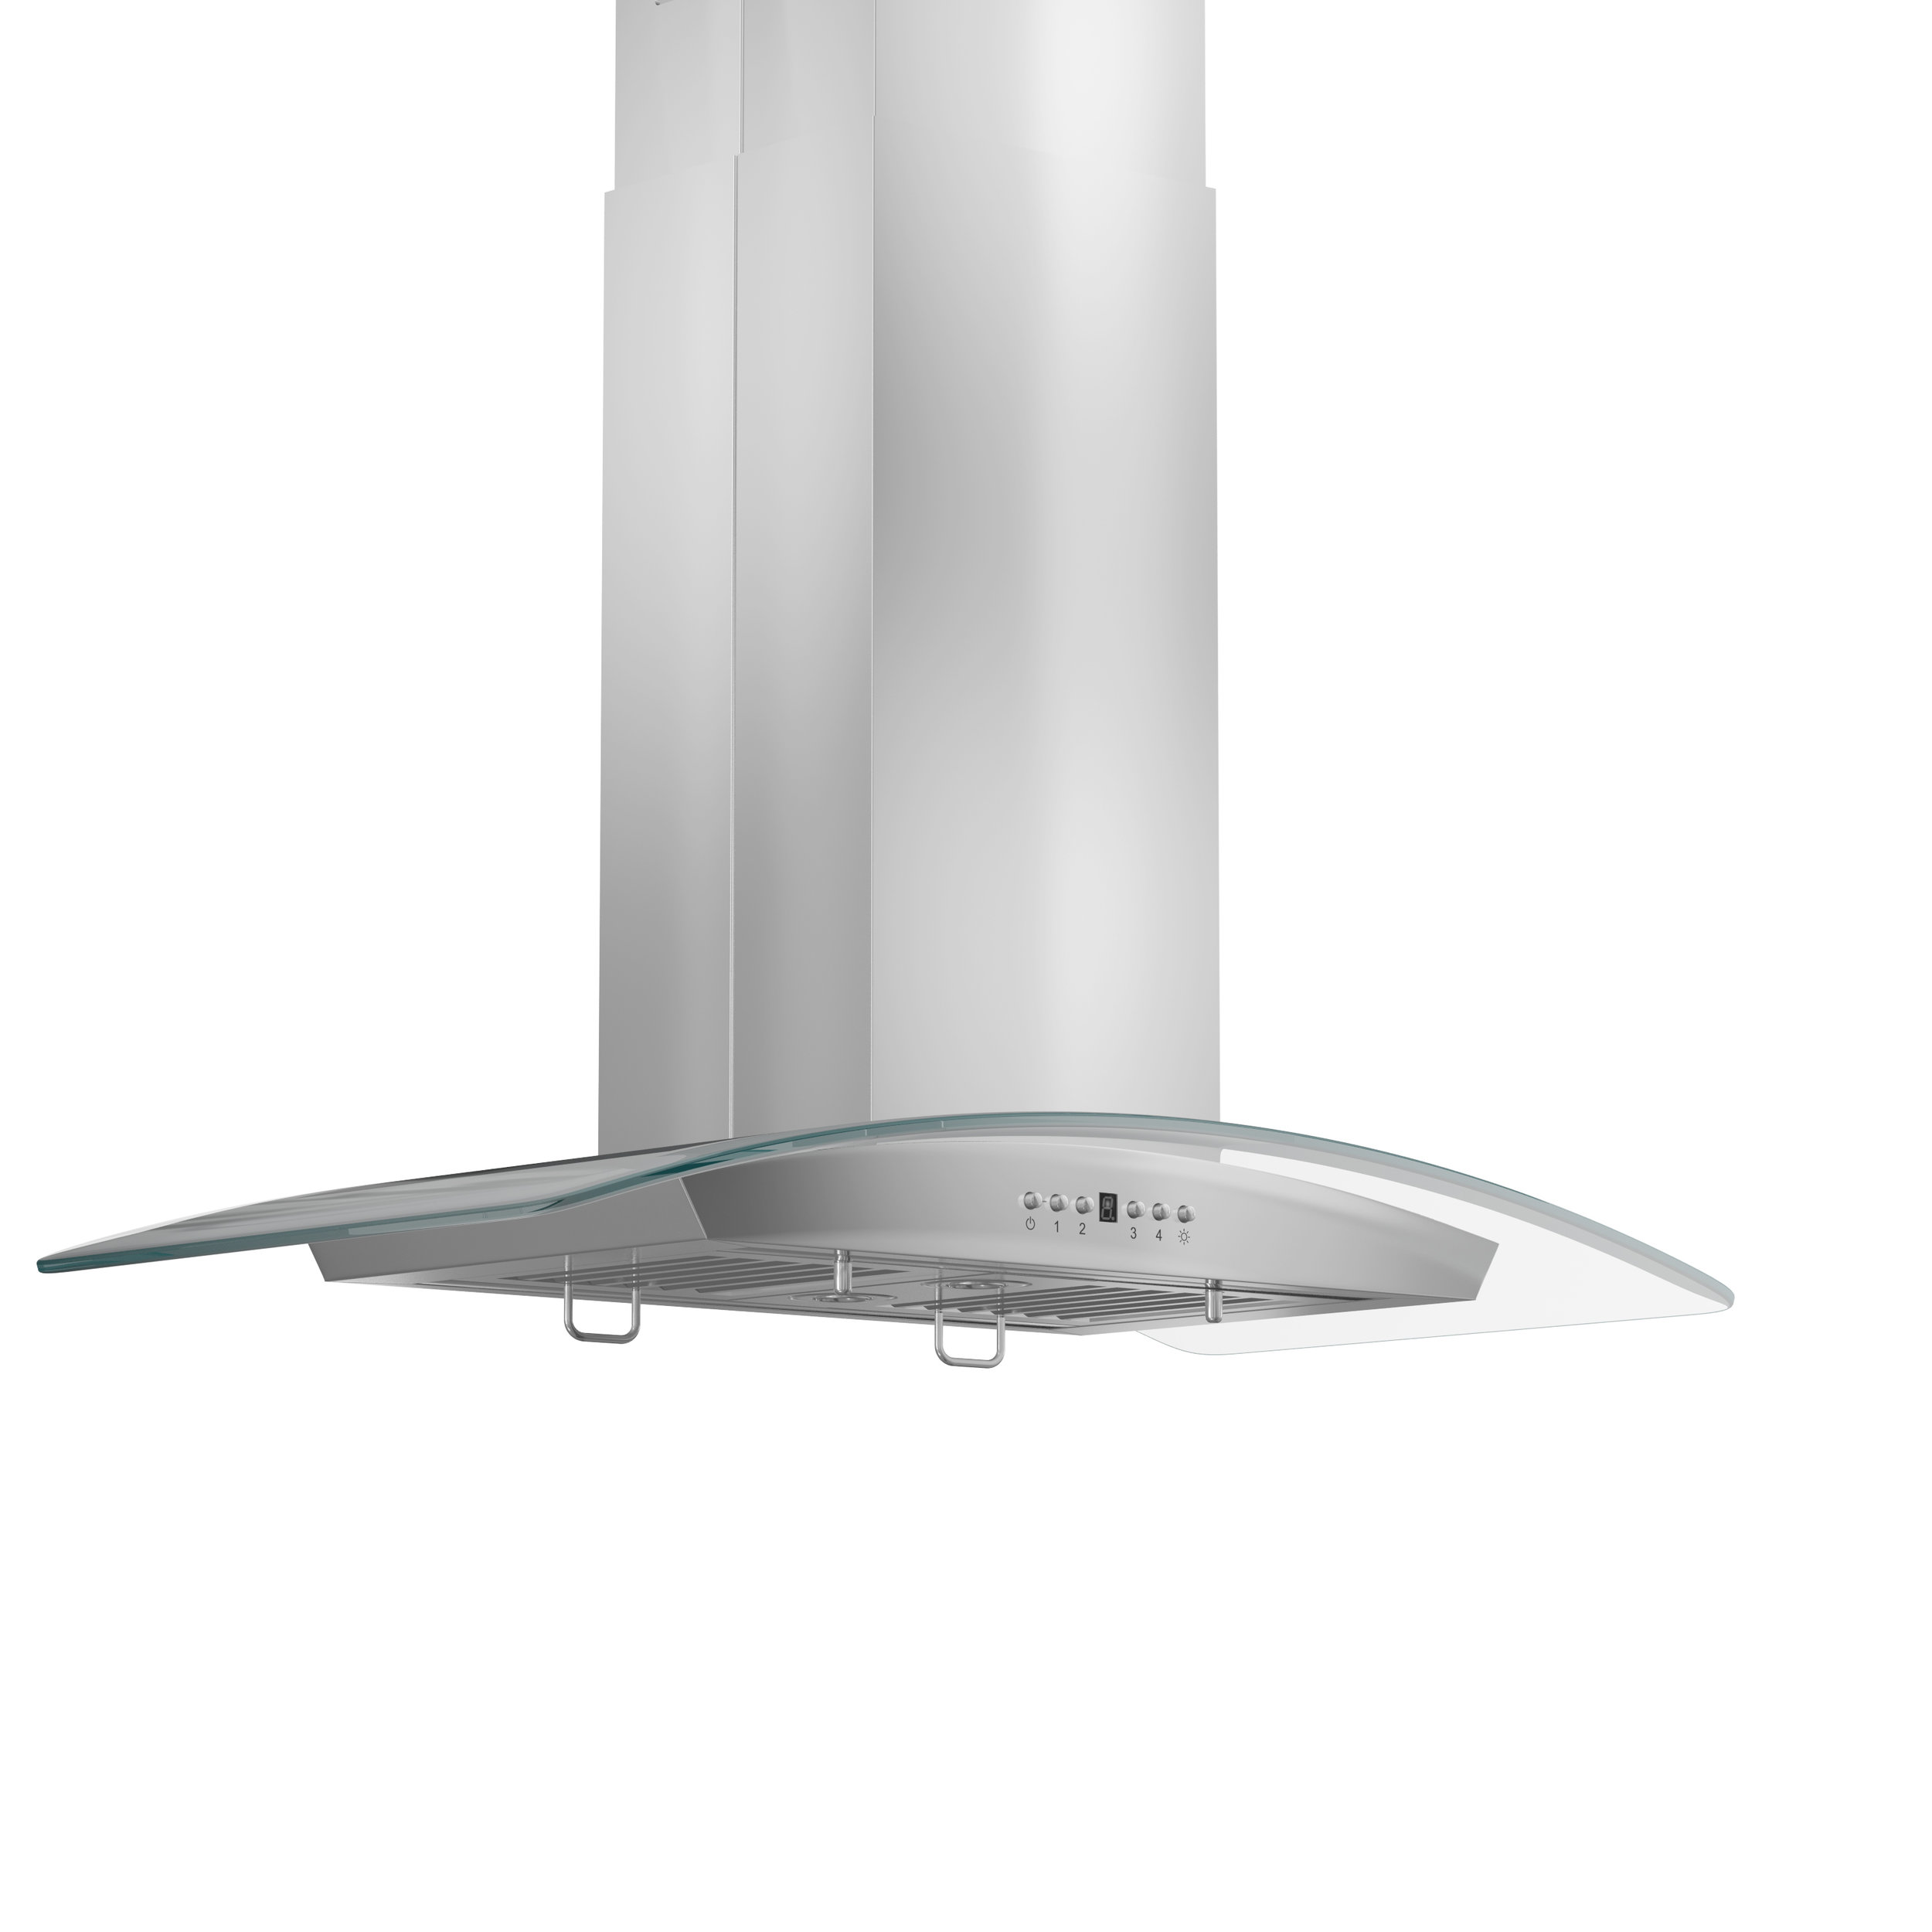 zline-stainless-steel-island-range-hood-GL5i-main.jpg